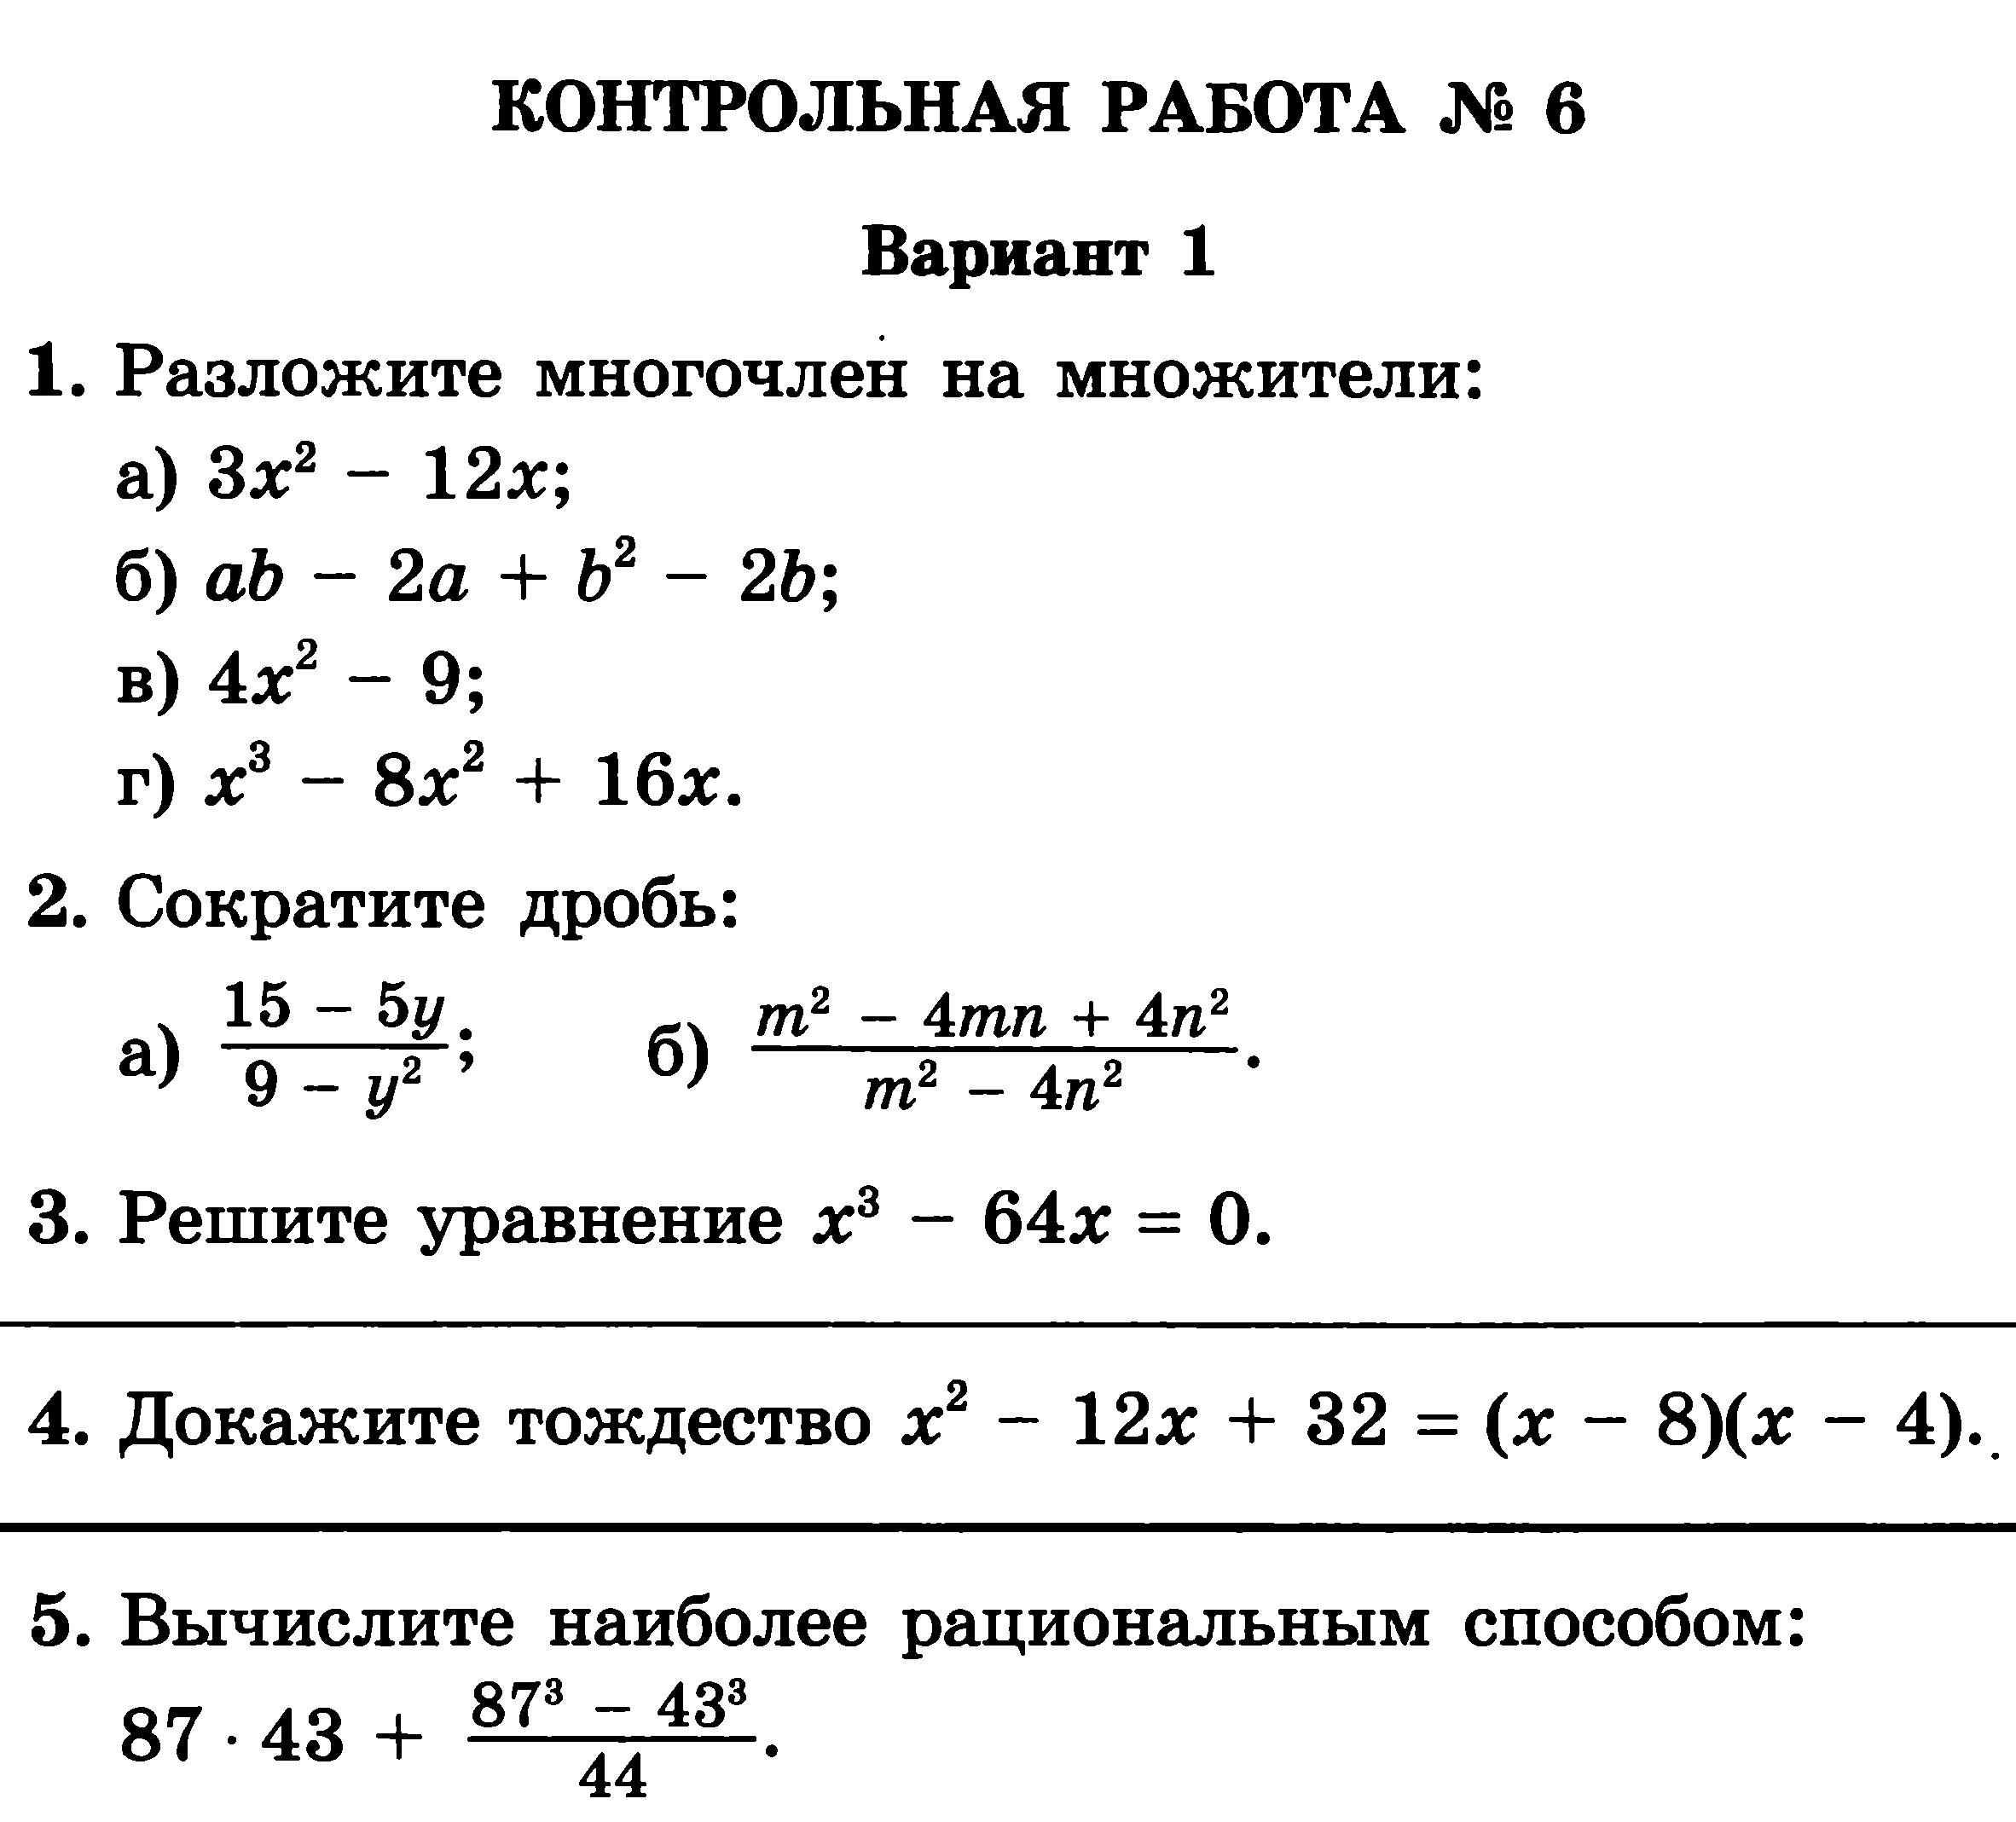 Разработка урока по алгебре 9 класс мордкович кубический корень из икс